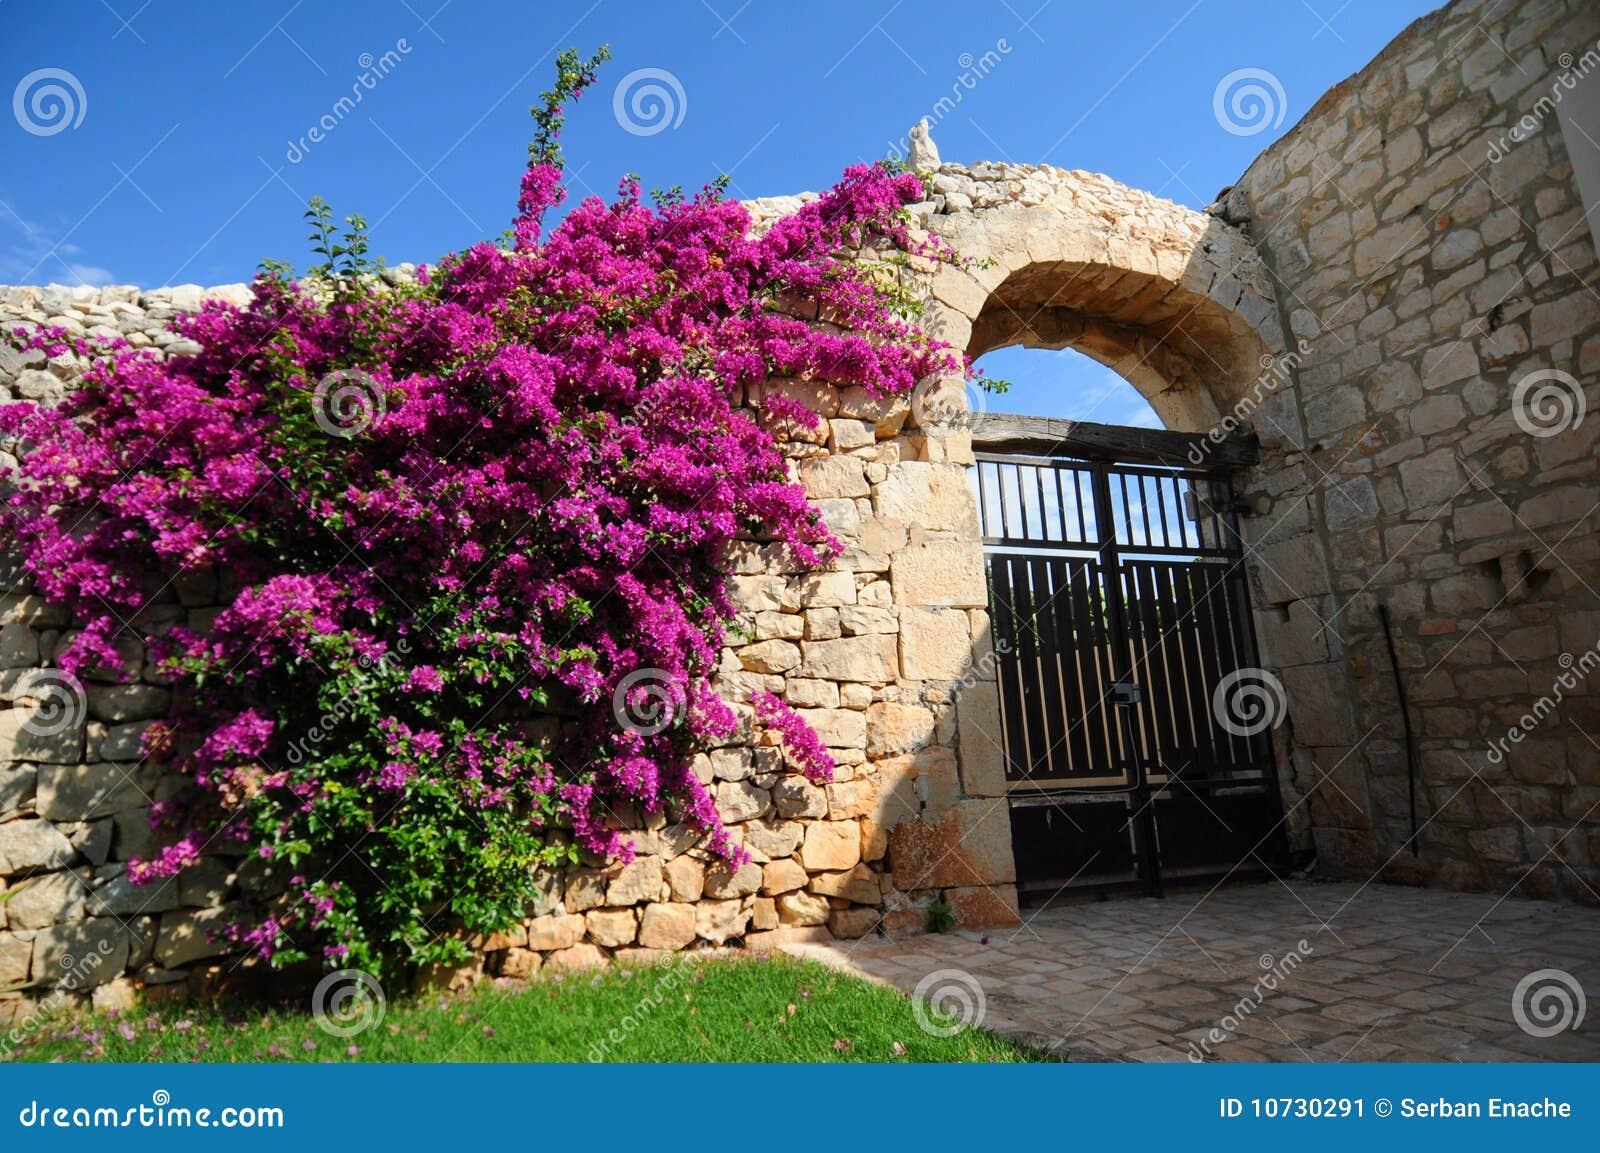 Flowers Building